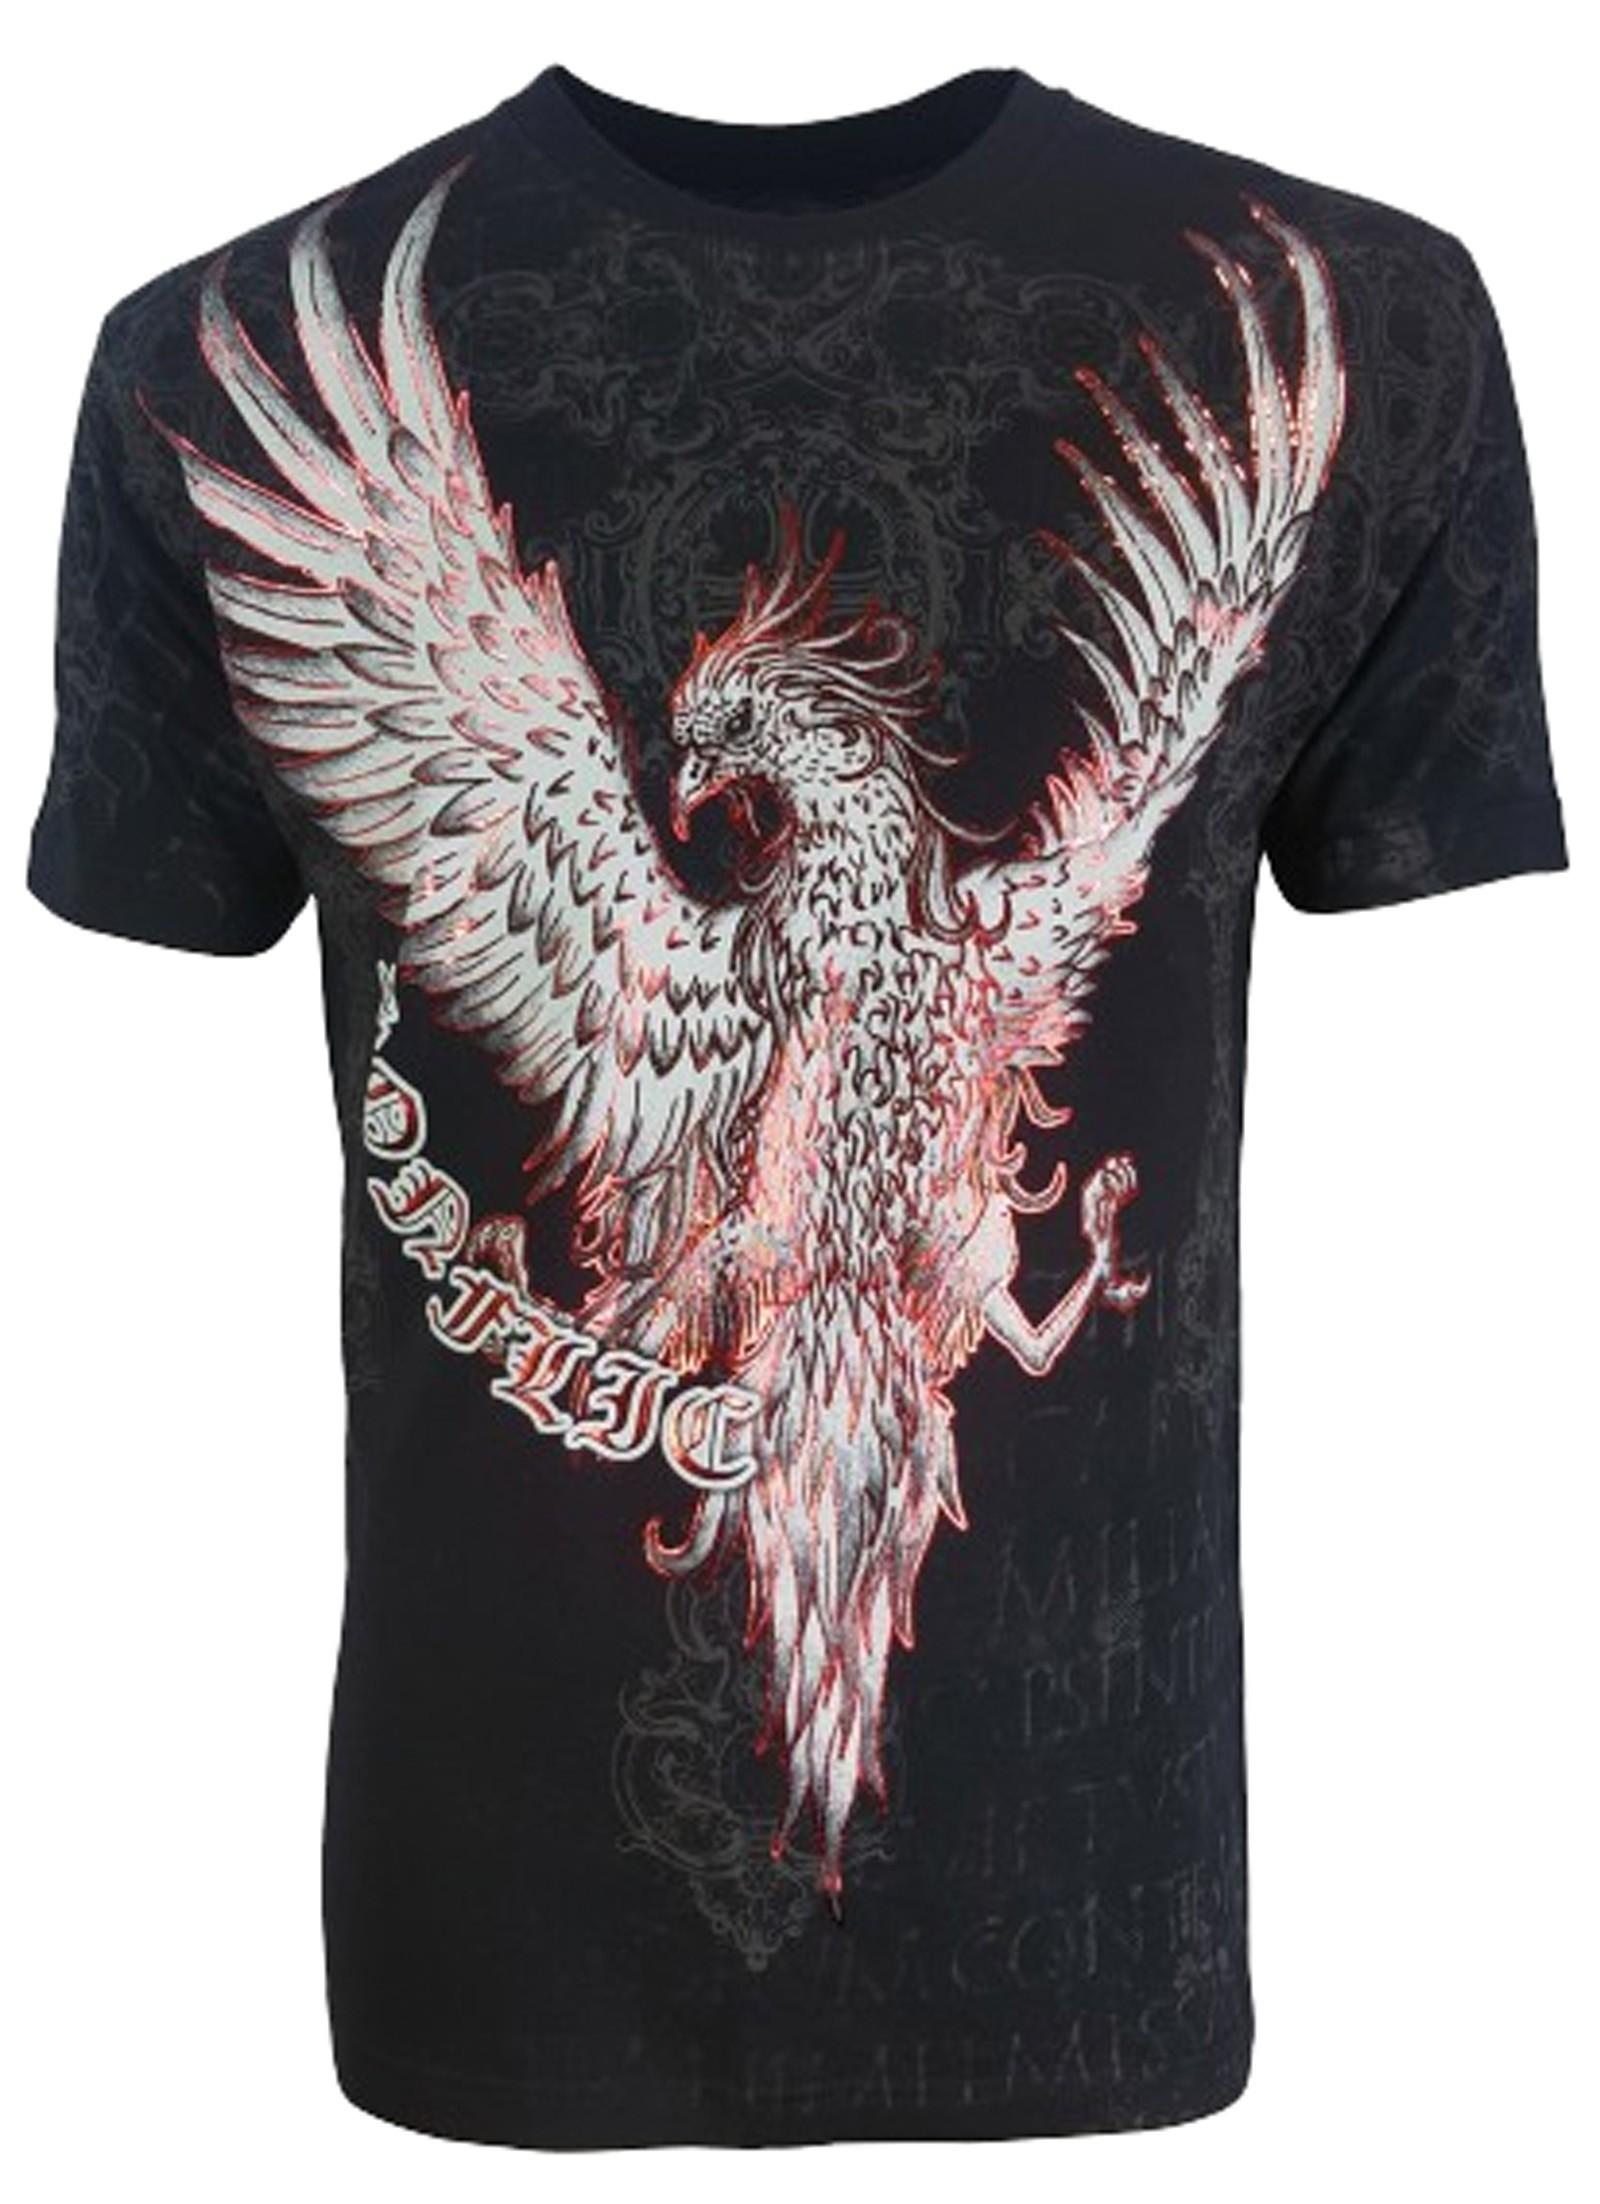 Konflic Clothing - Red Phoenix T-Shirt